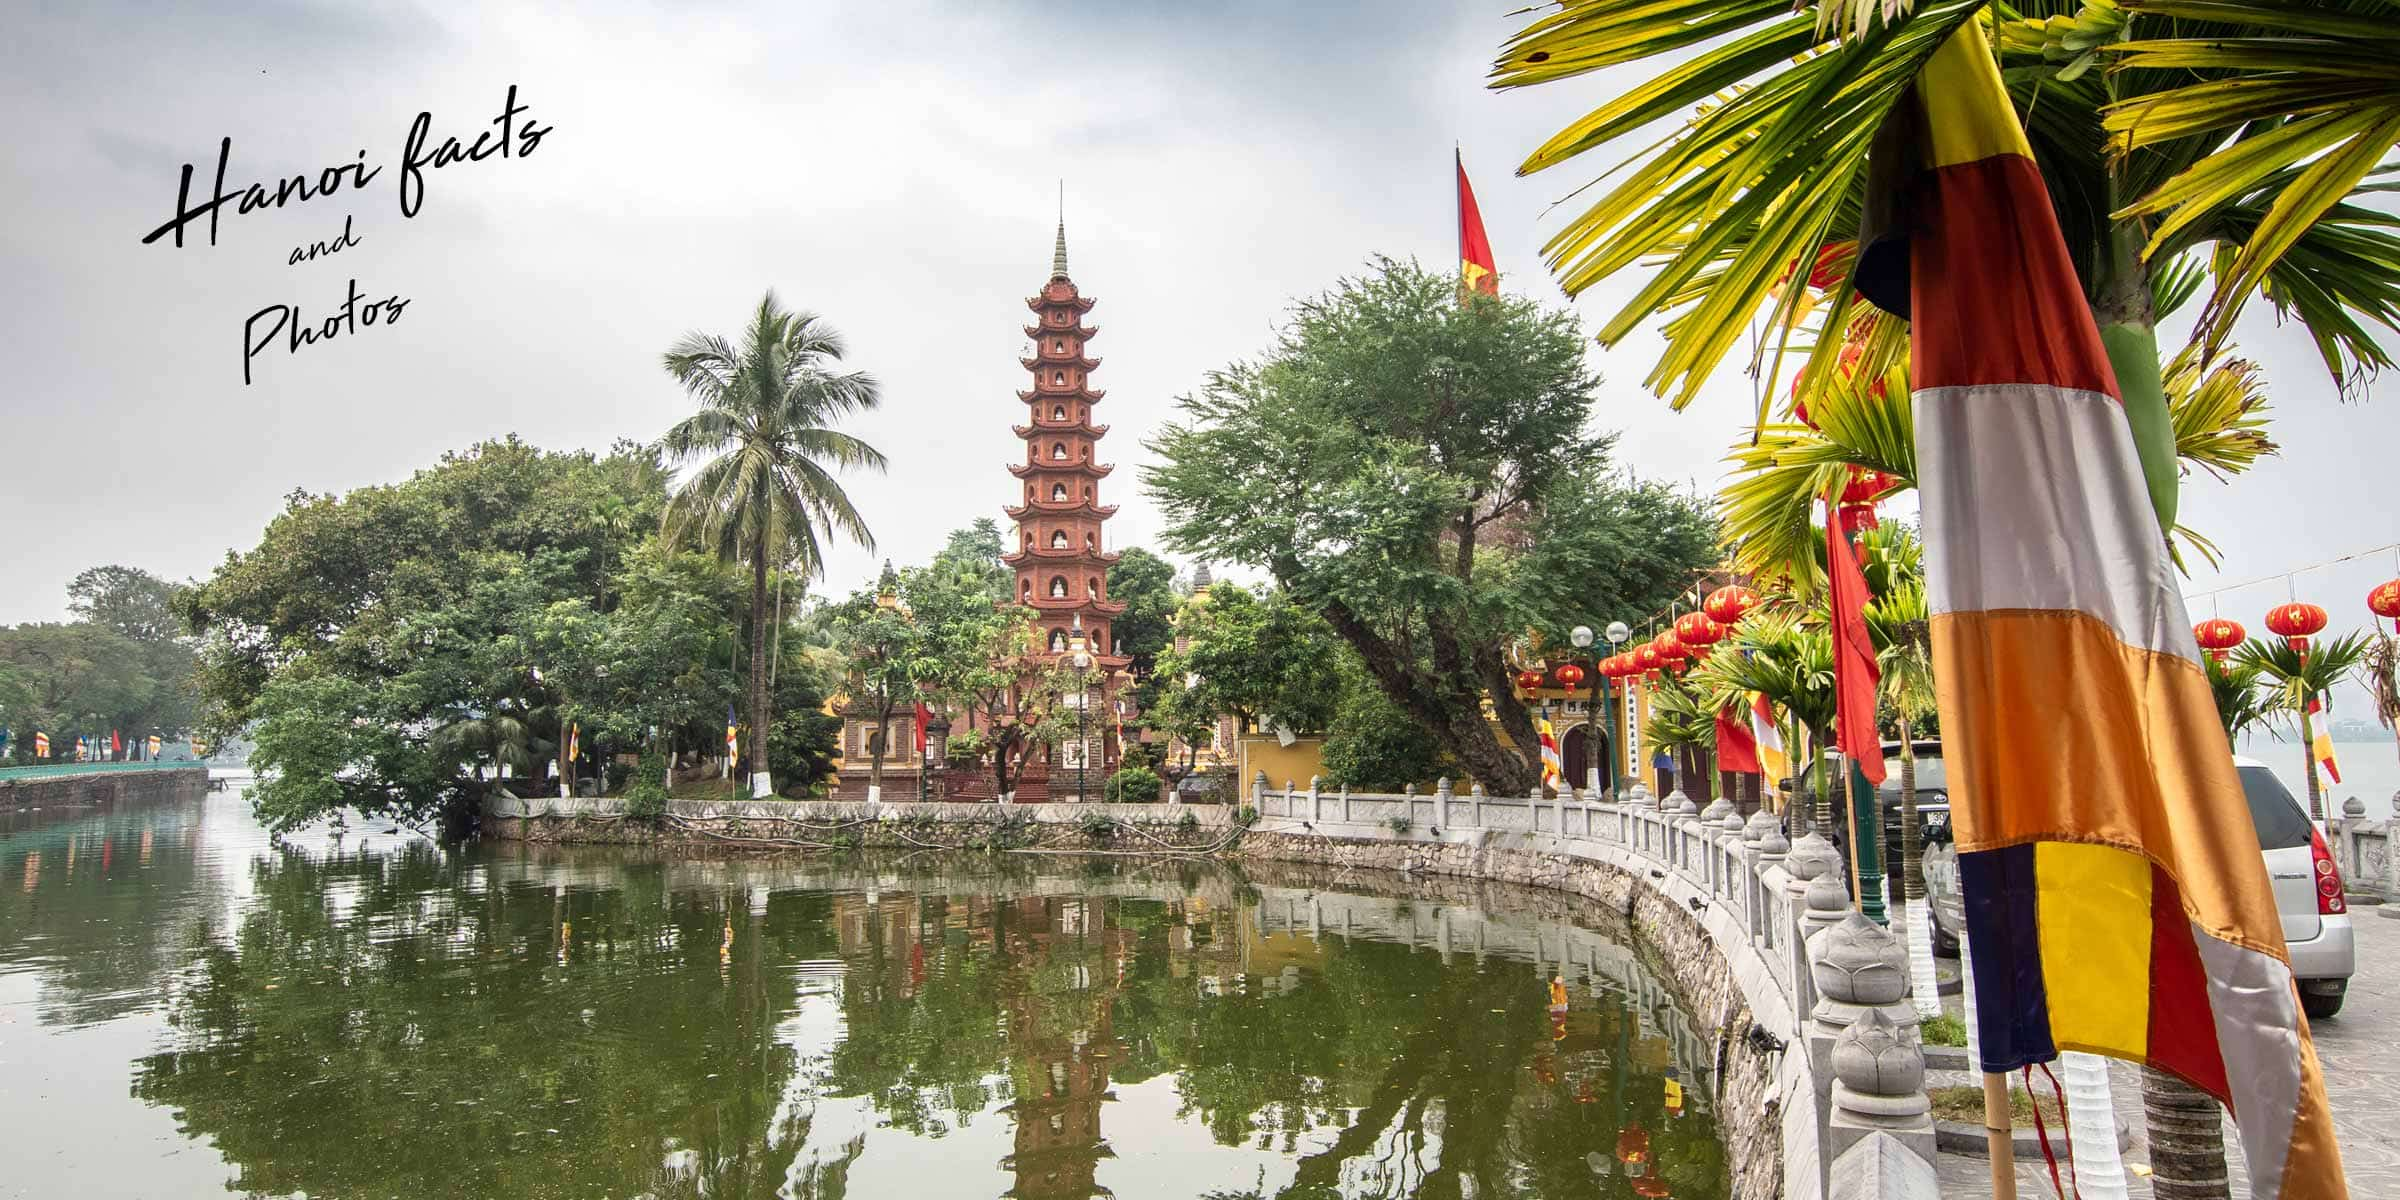 Hanoi facts and photos